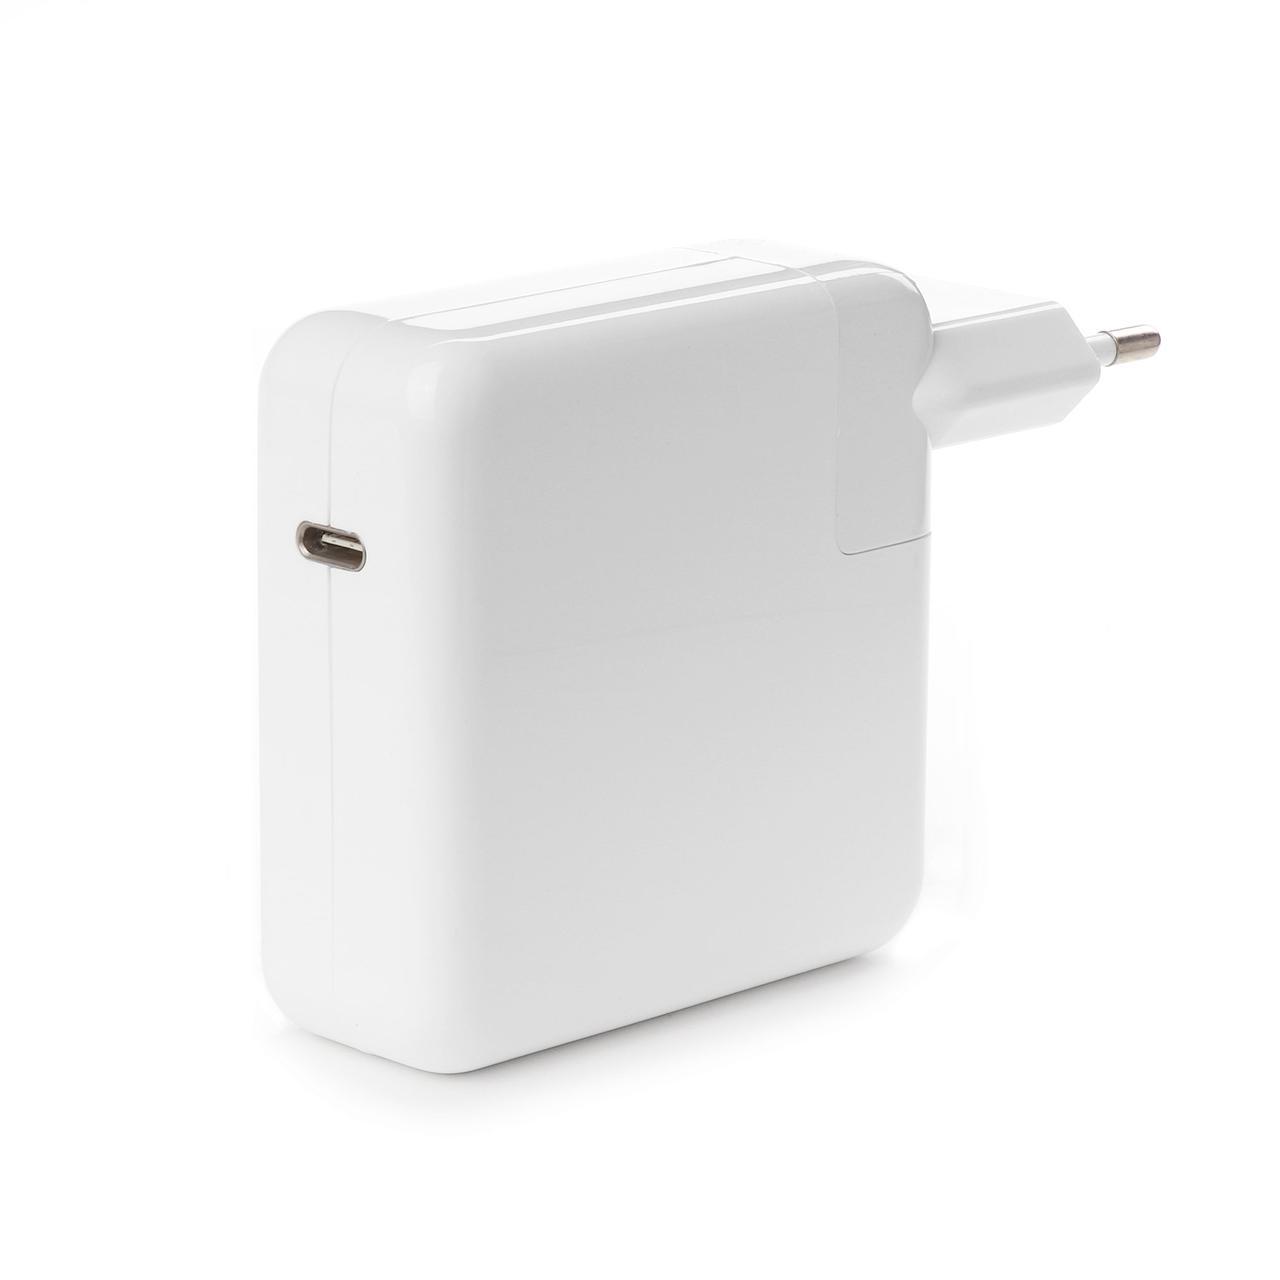 Блок питания USB-C 61W, Power Delivery 3.0, Quick Charge 3.0, Белый